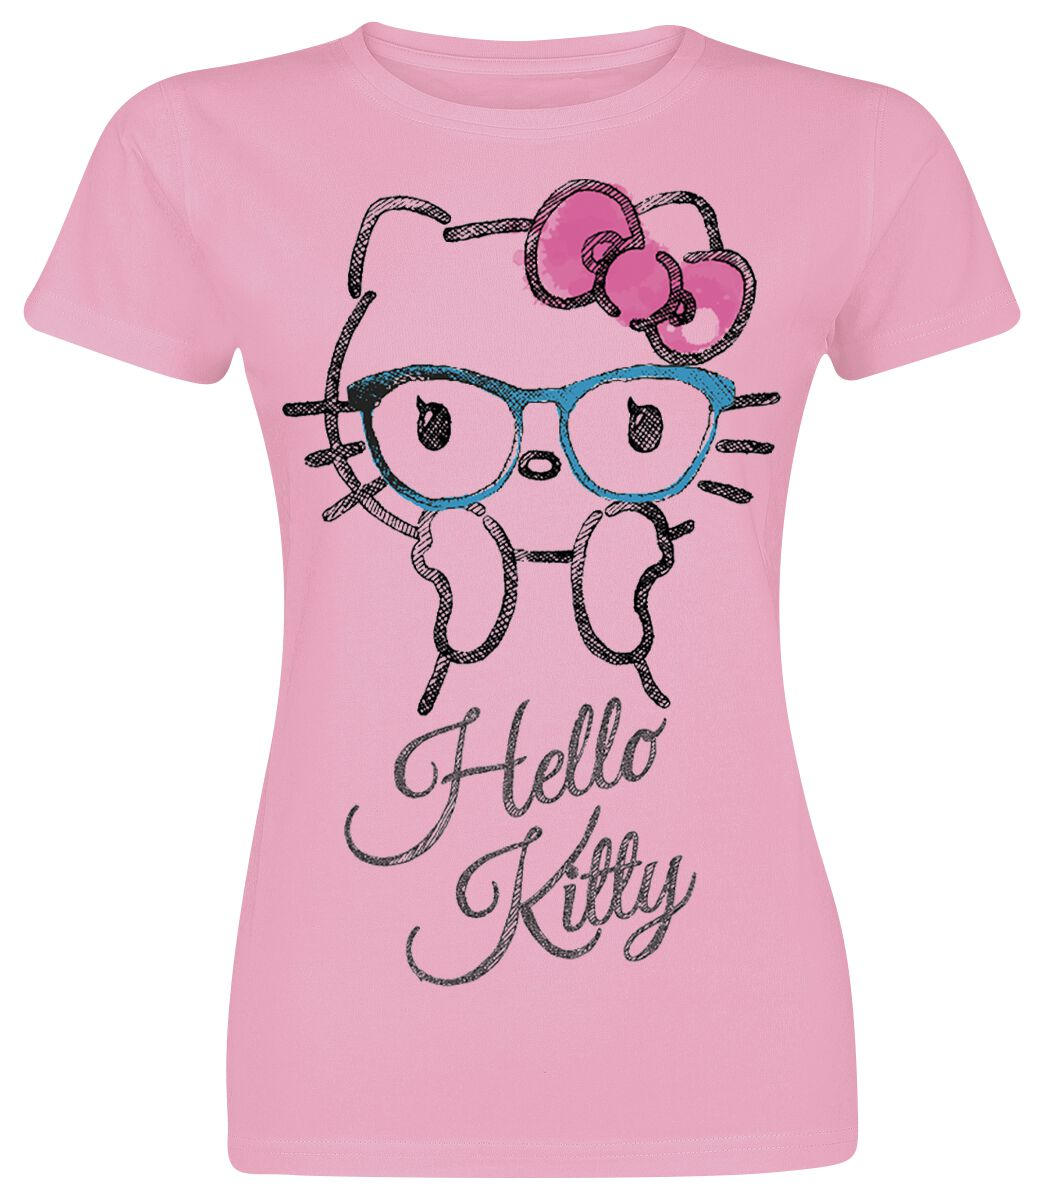 Merch dla Fanów - Koszulki - Koszulka damska Hello Kitty Surprised Koszulka damska jasnoróżowy (Light Pink) - 355066